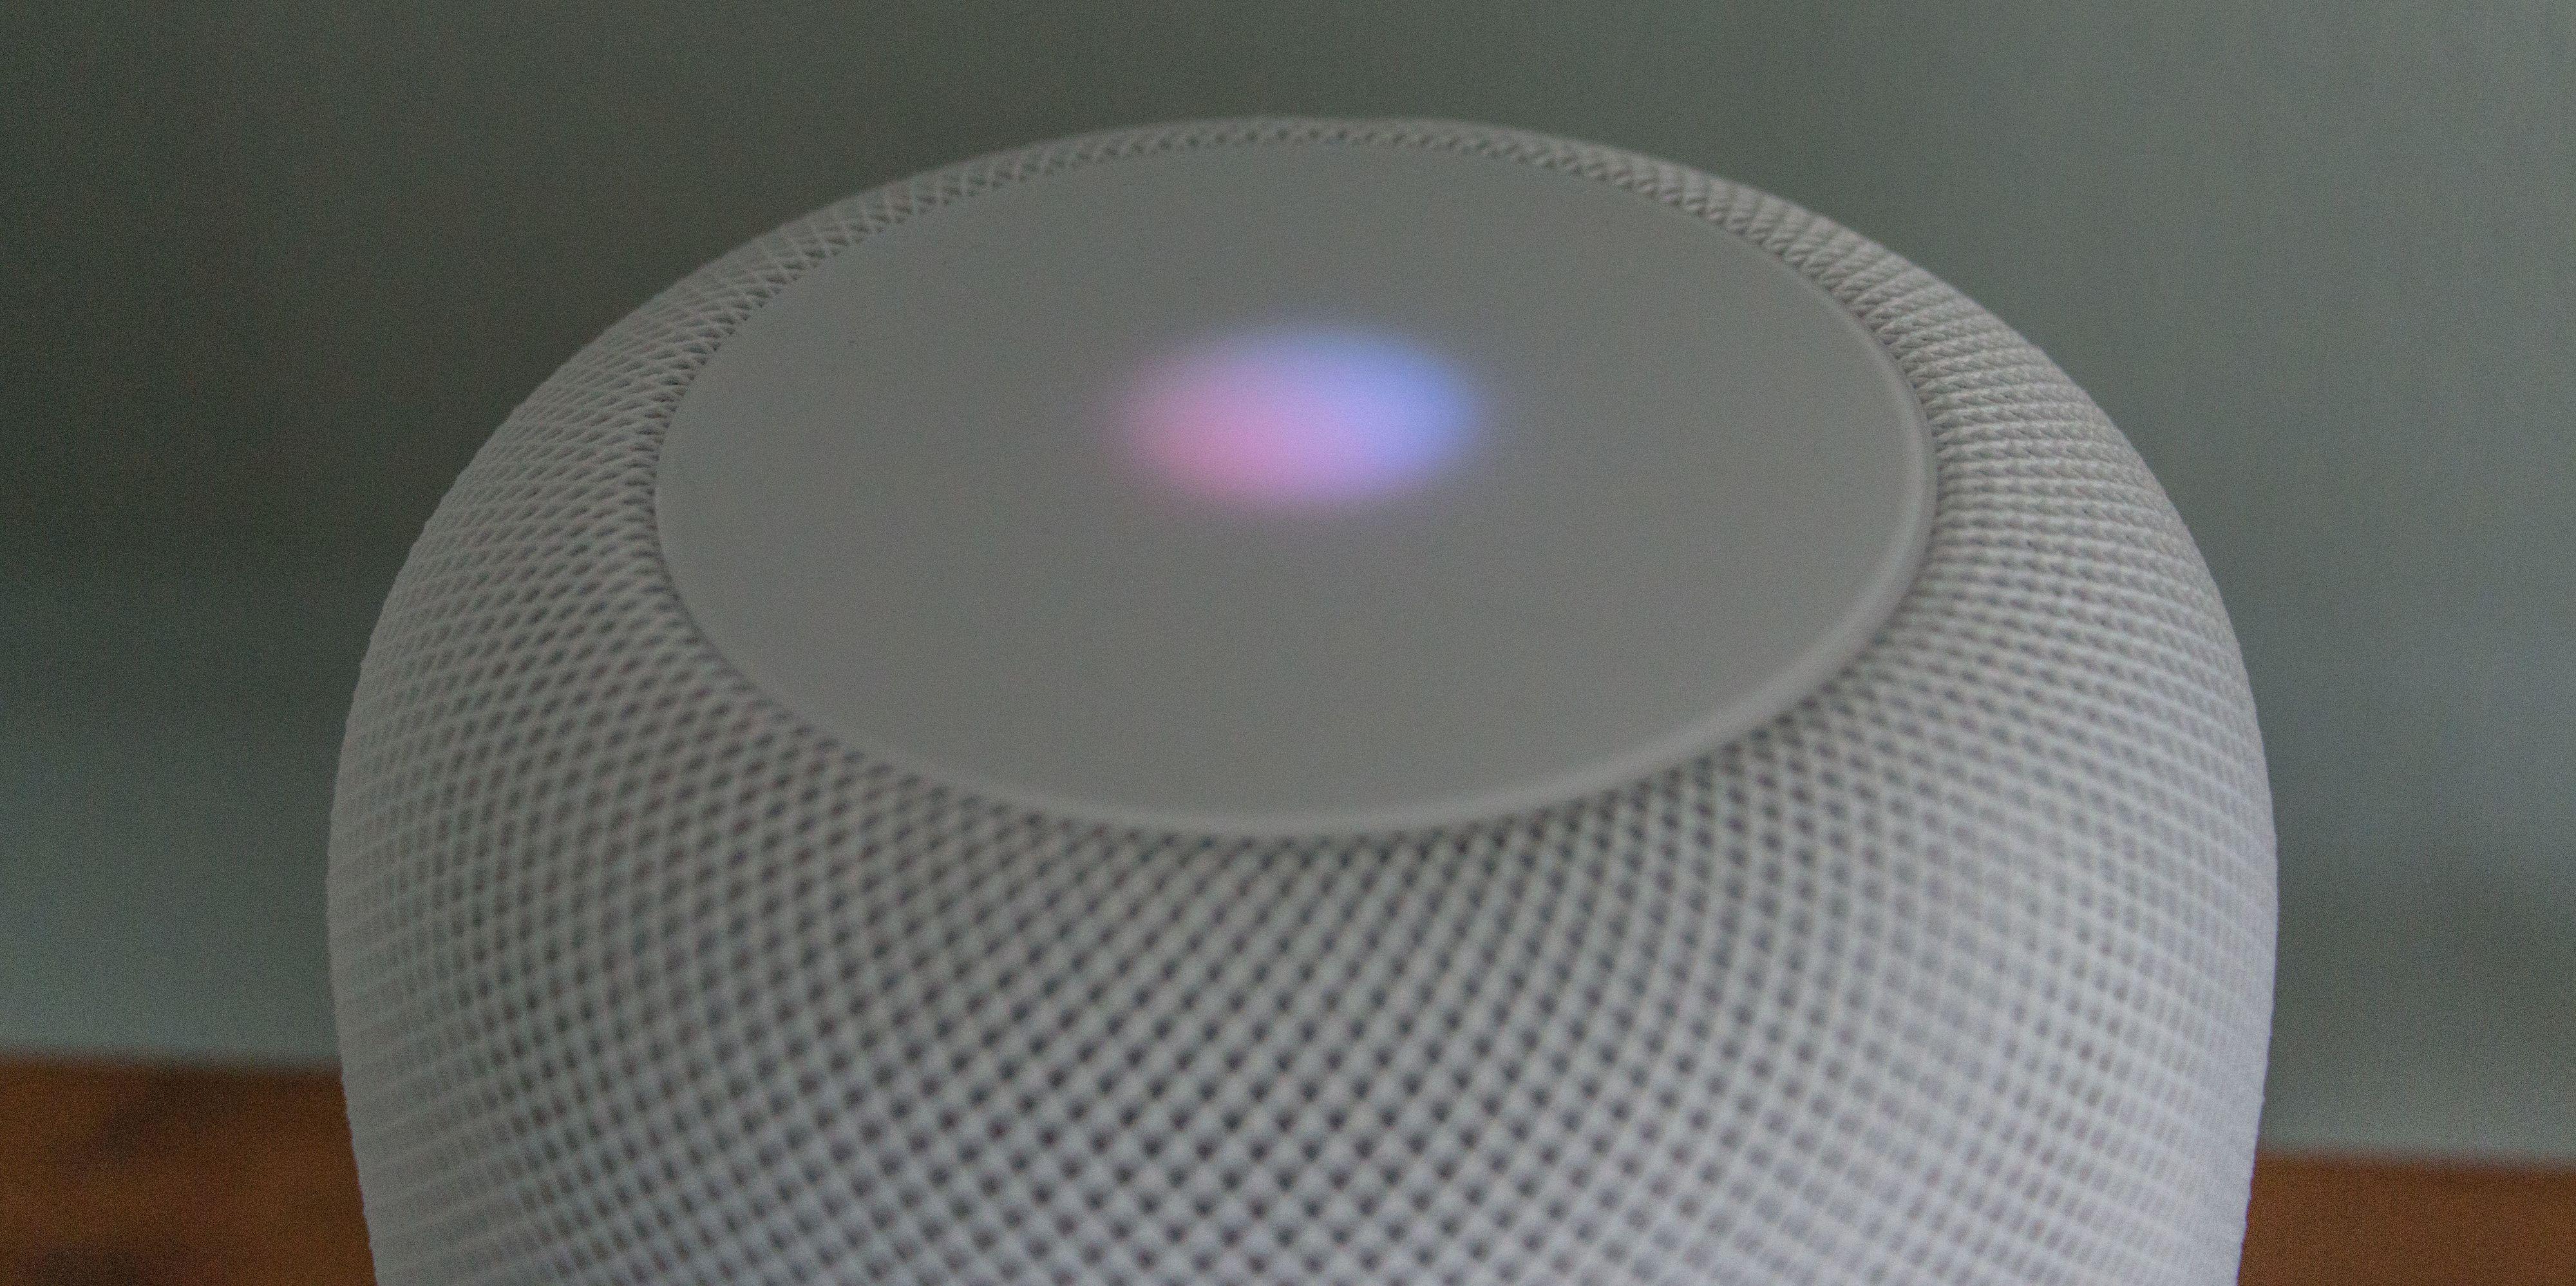 Det pulserende lyset på toppen signaliserer at Siri er aktiv.